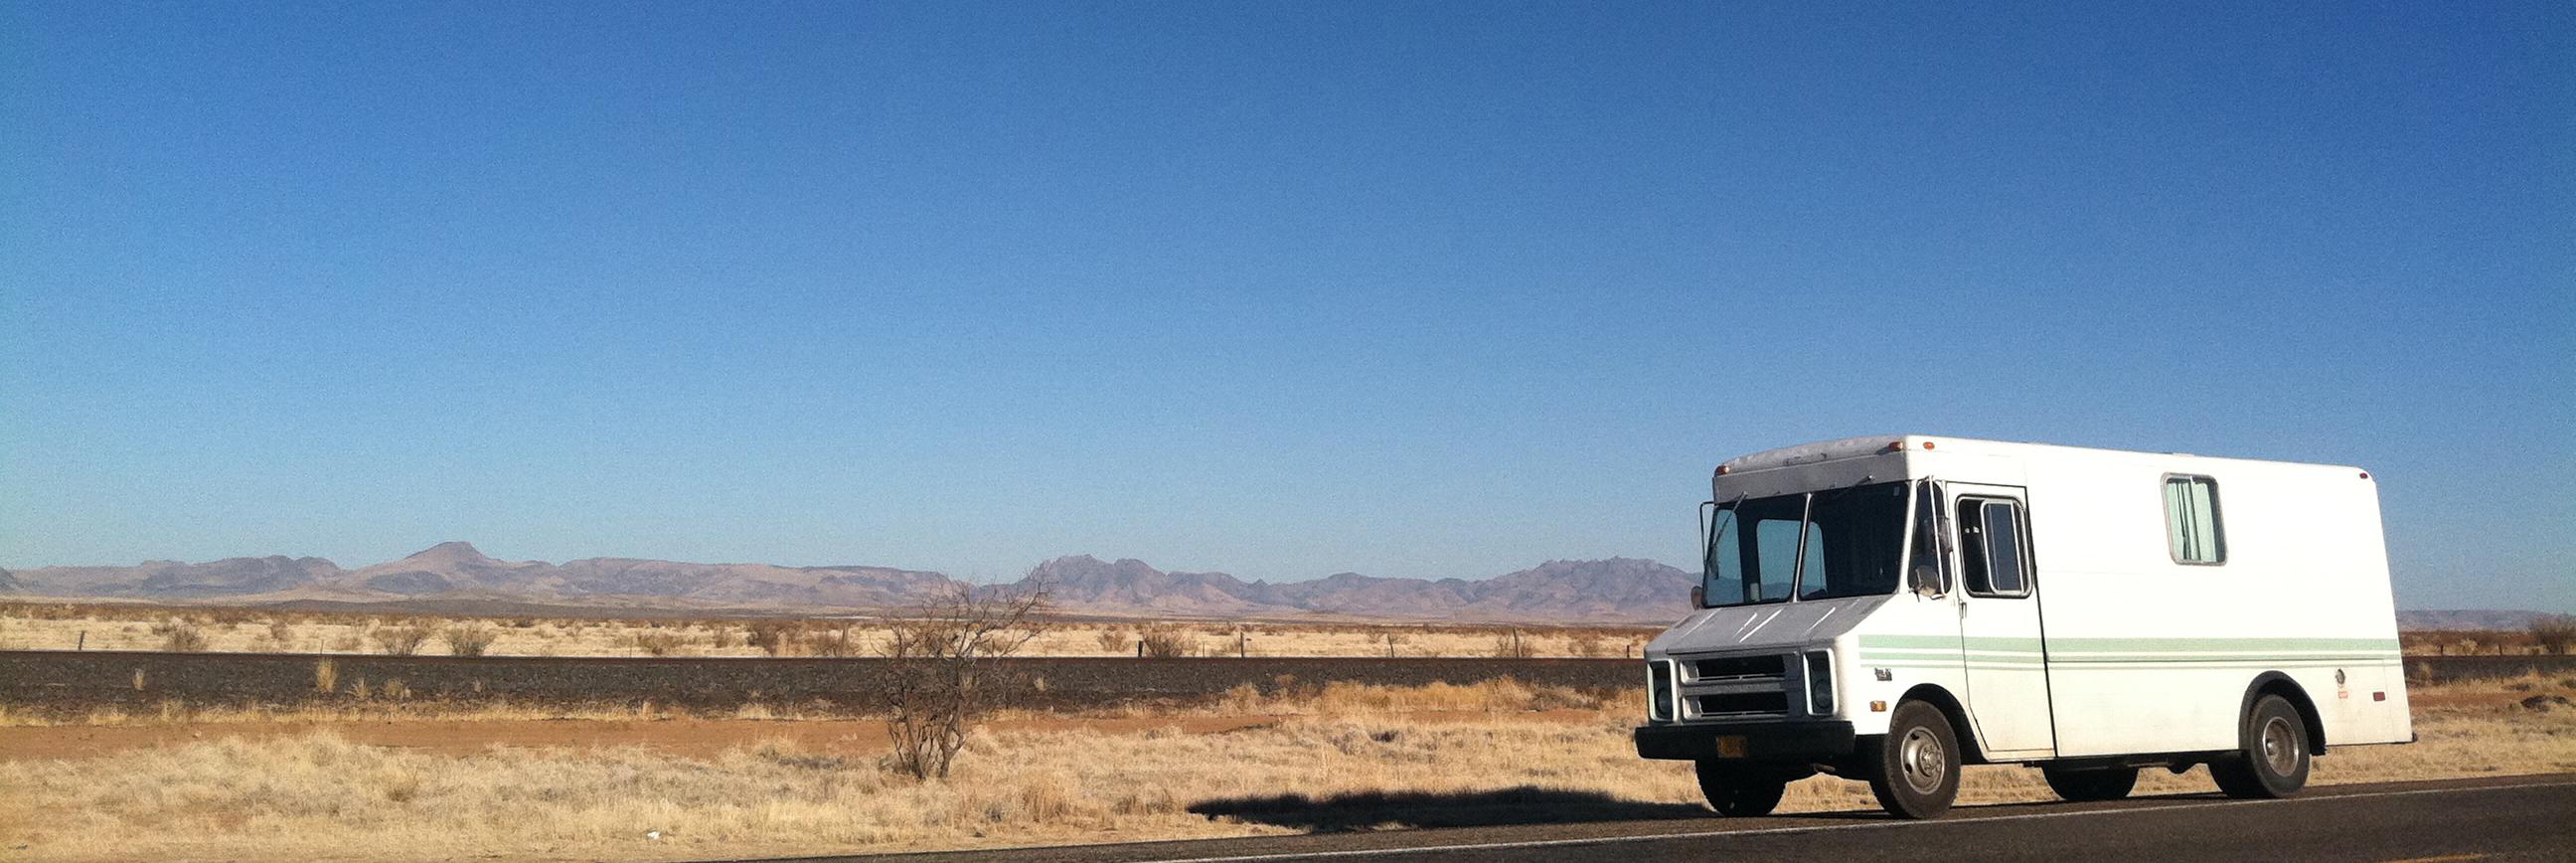 cropped-truck.jpg